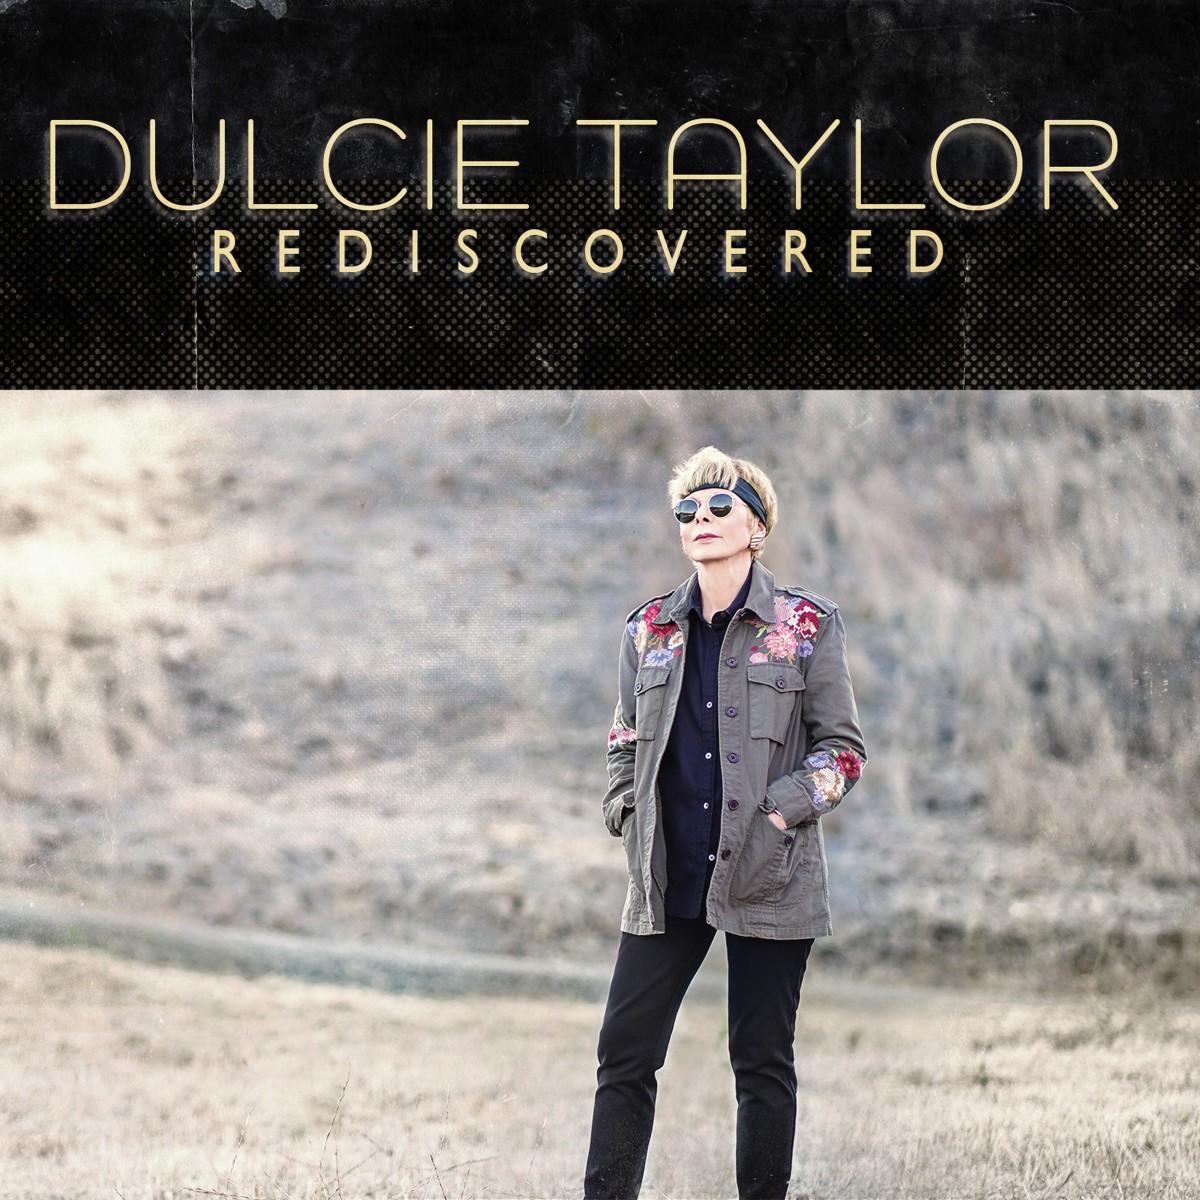 Dulcie Taylor